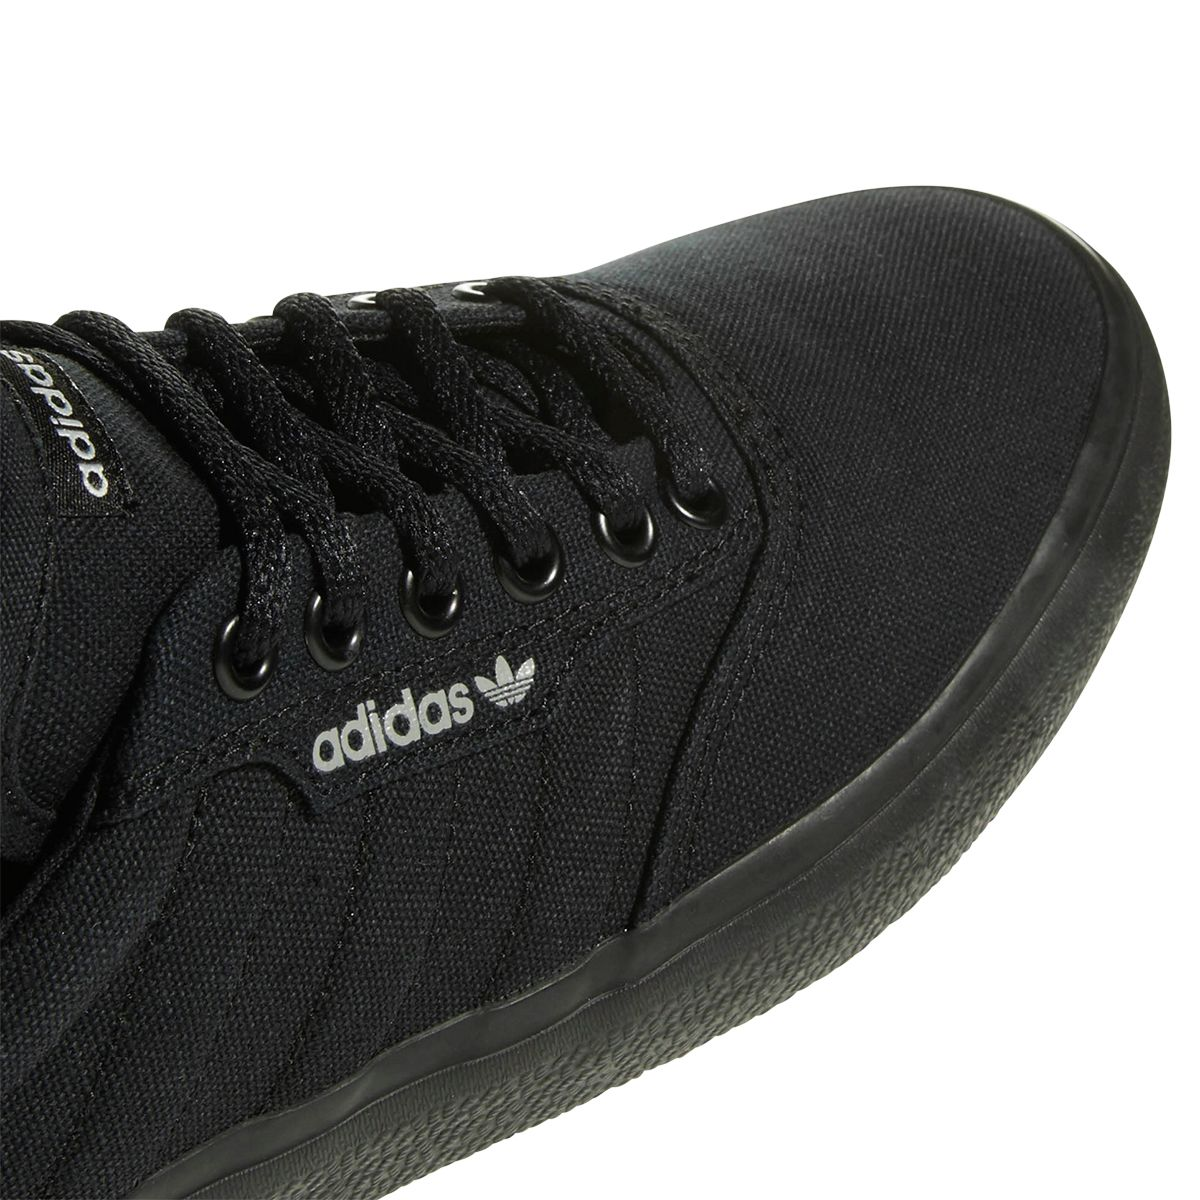 Adidas-3MC-Shoe-Men-039-s thumbnail 12